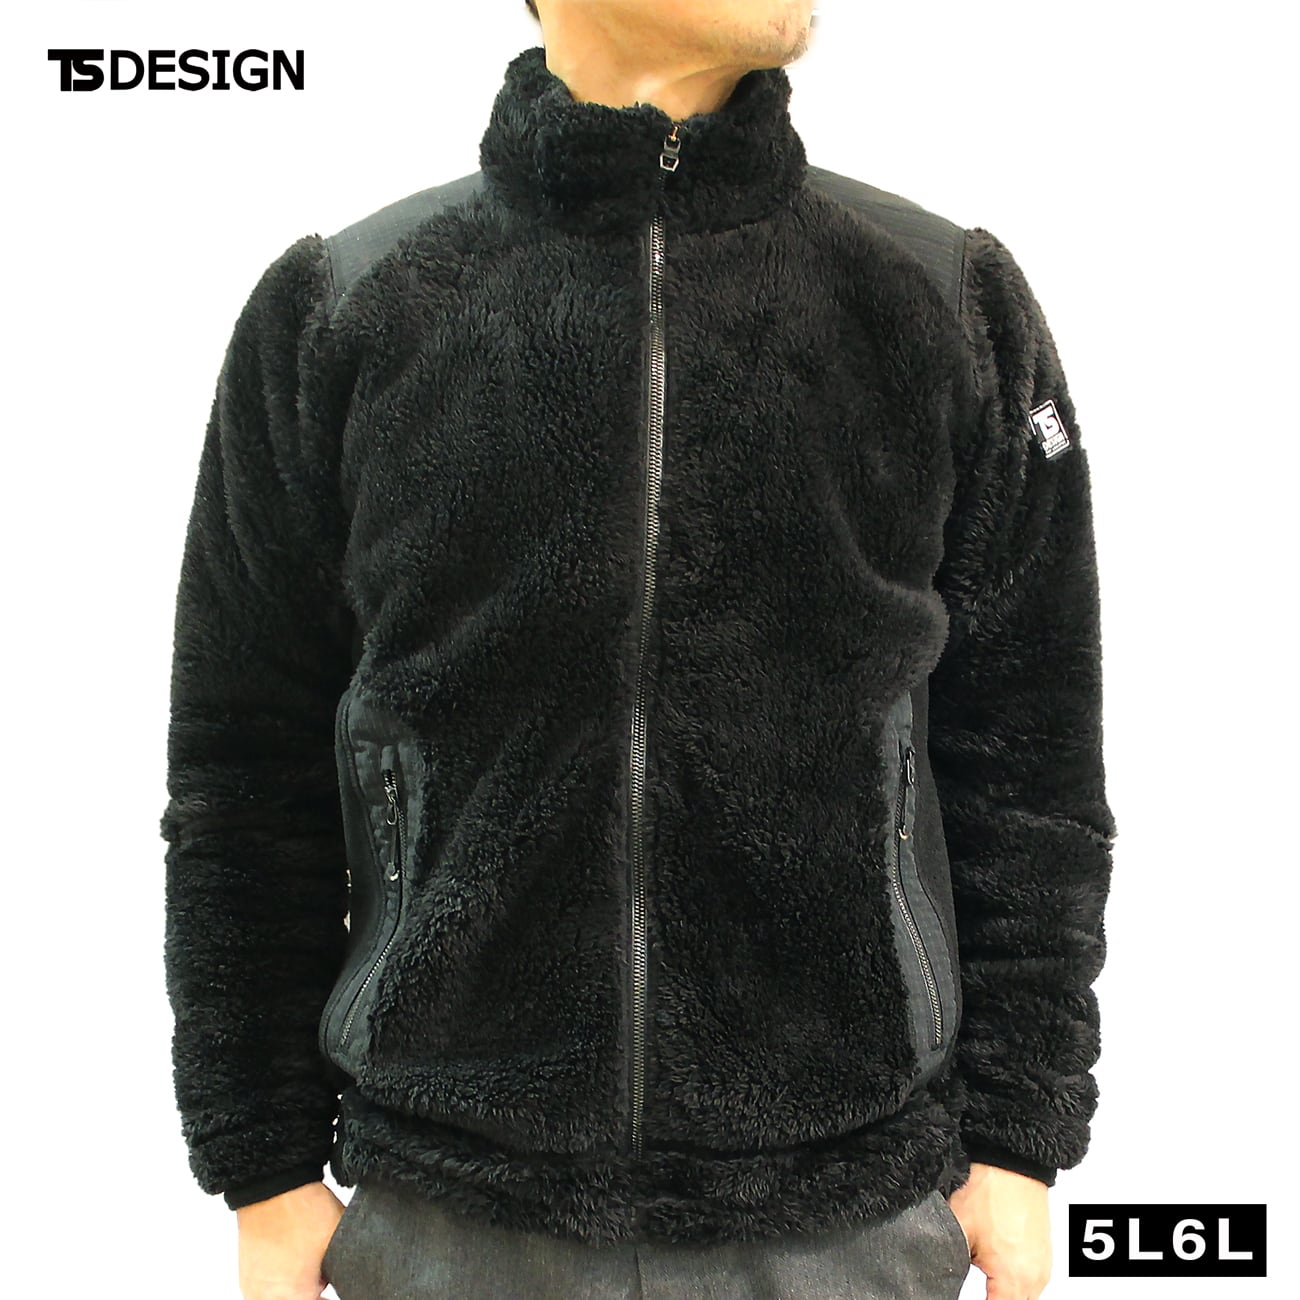 TS DESIGN TS DELTA Bulky fleece Jacket 5L.6L